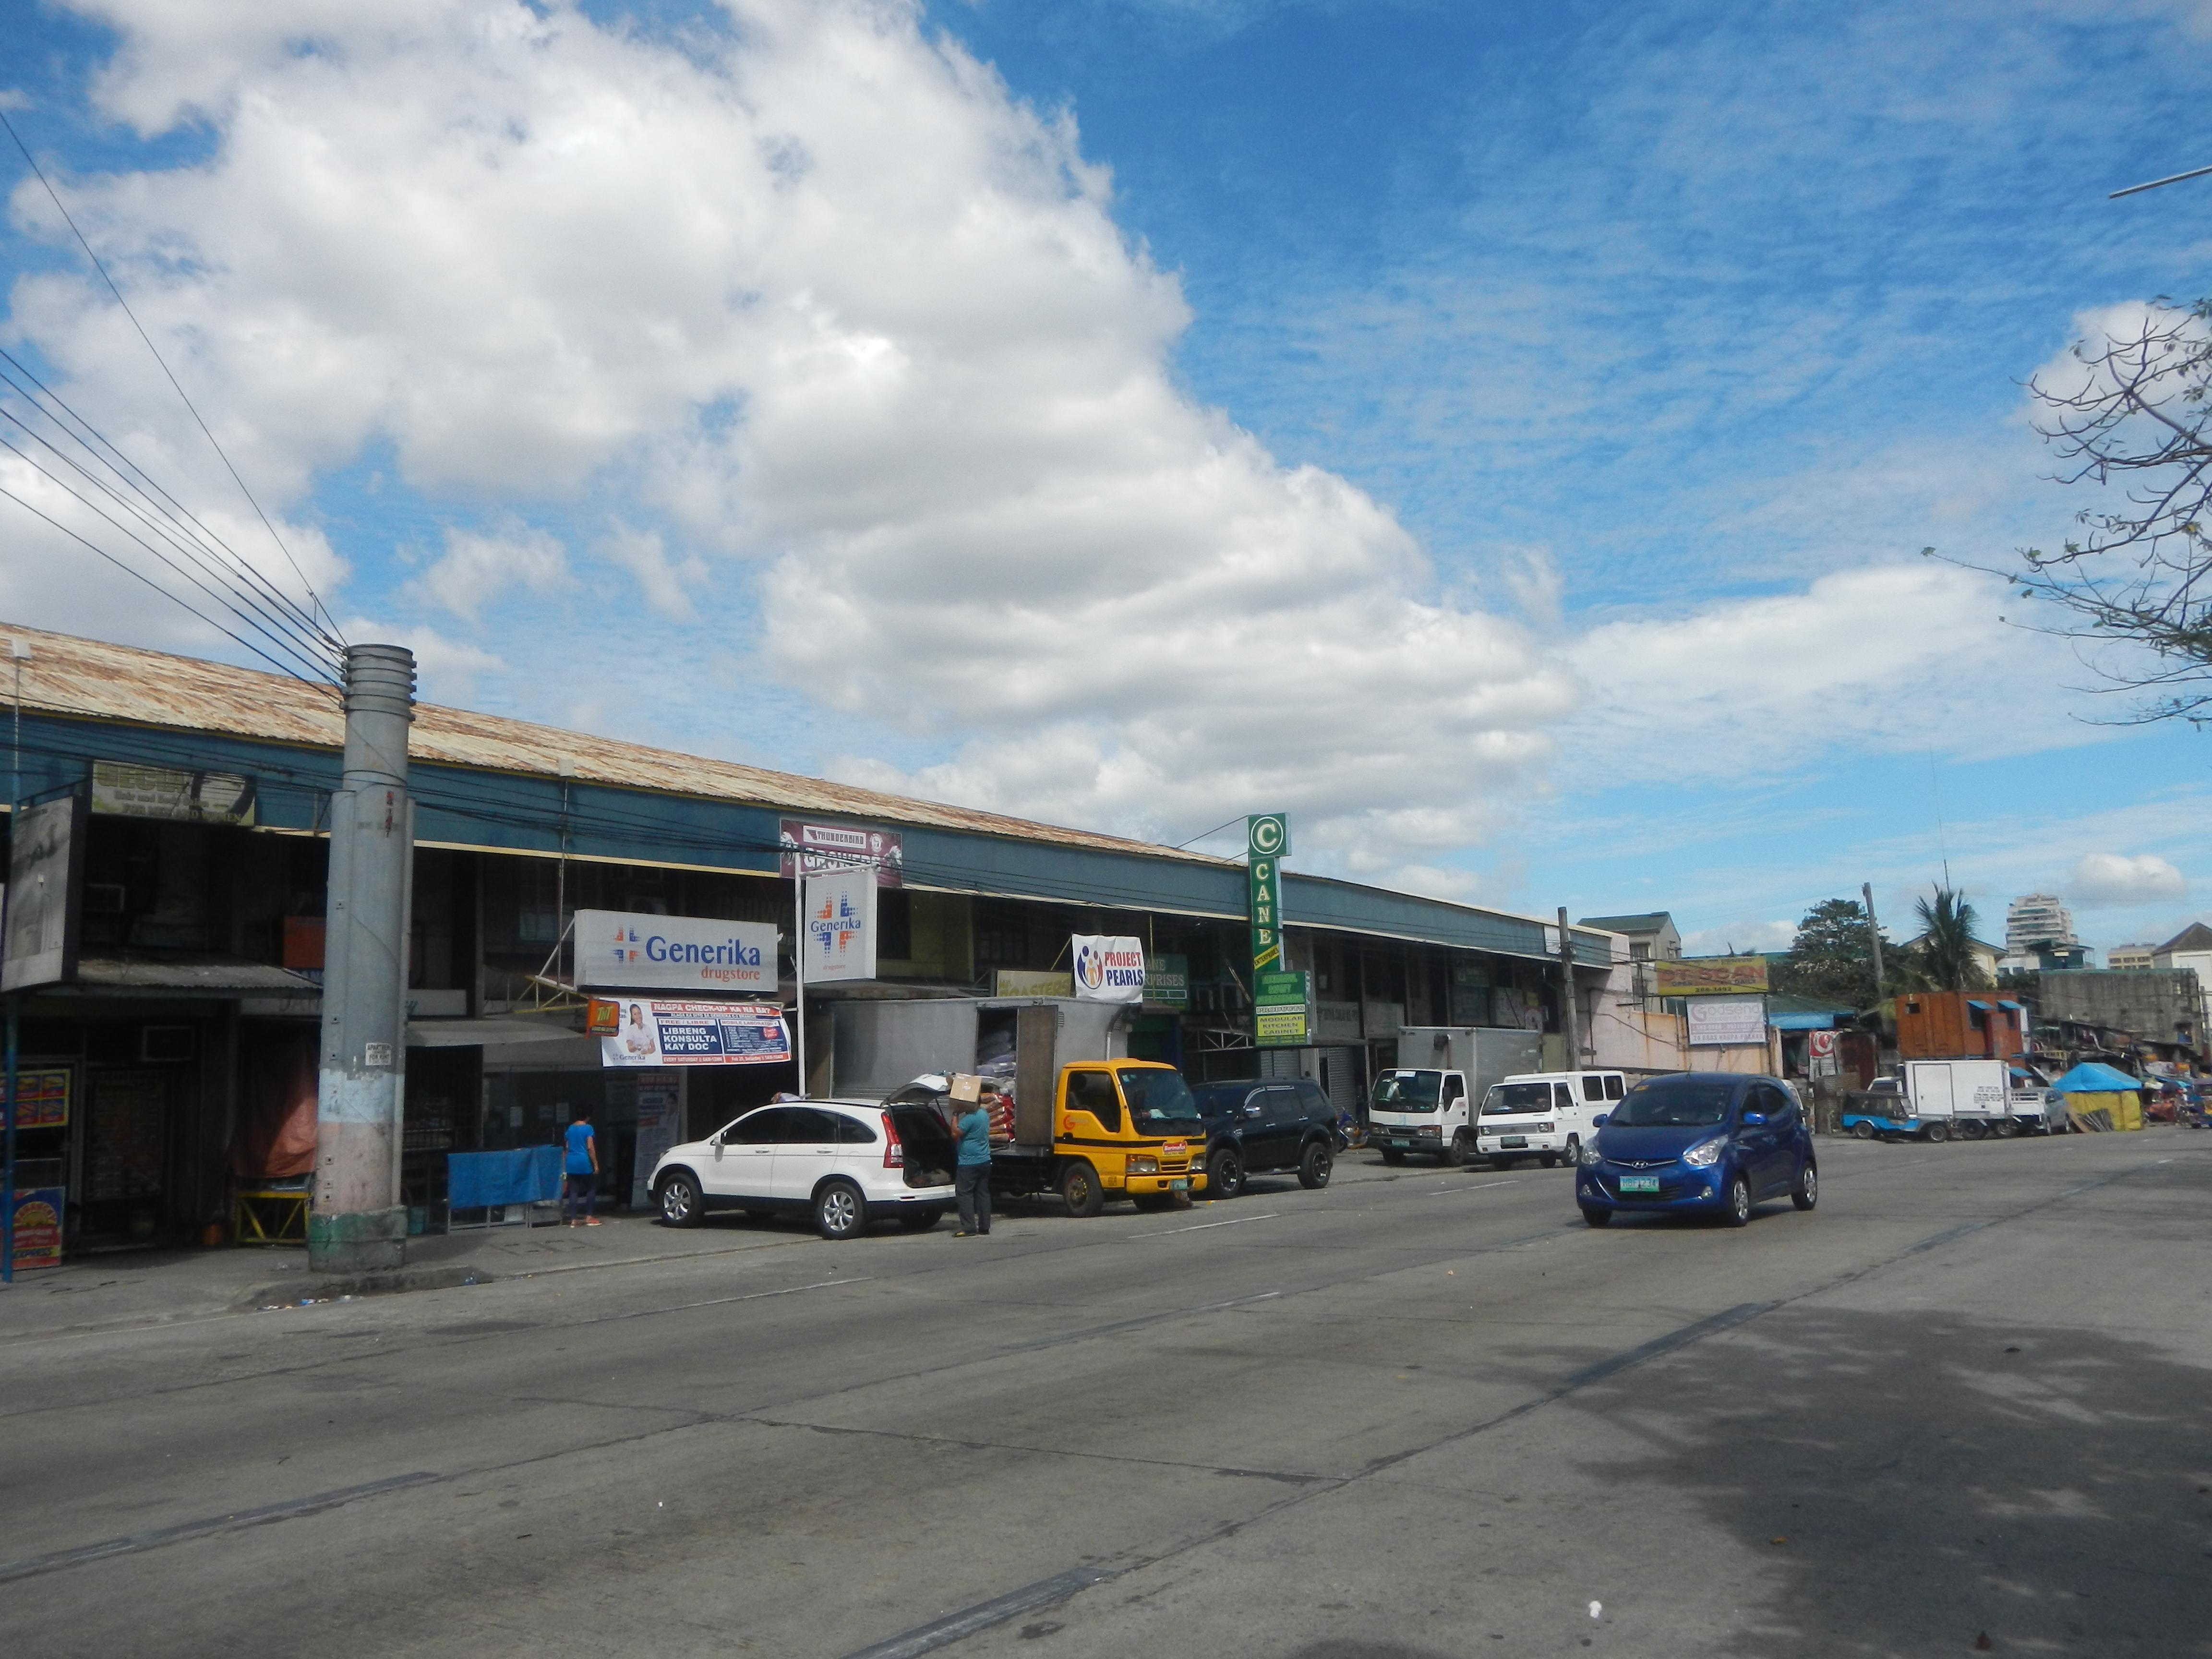 File:09169jfCaloocan City Circumferential Road 32fvf.jpg - Wikimedia ...